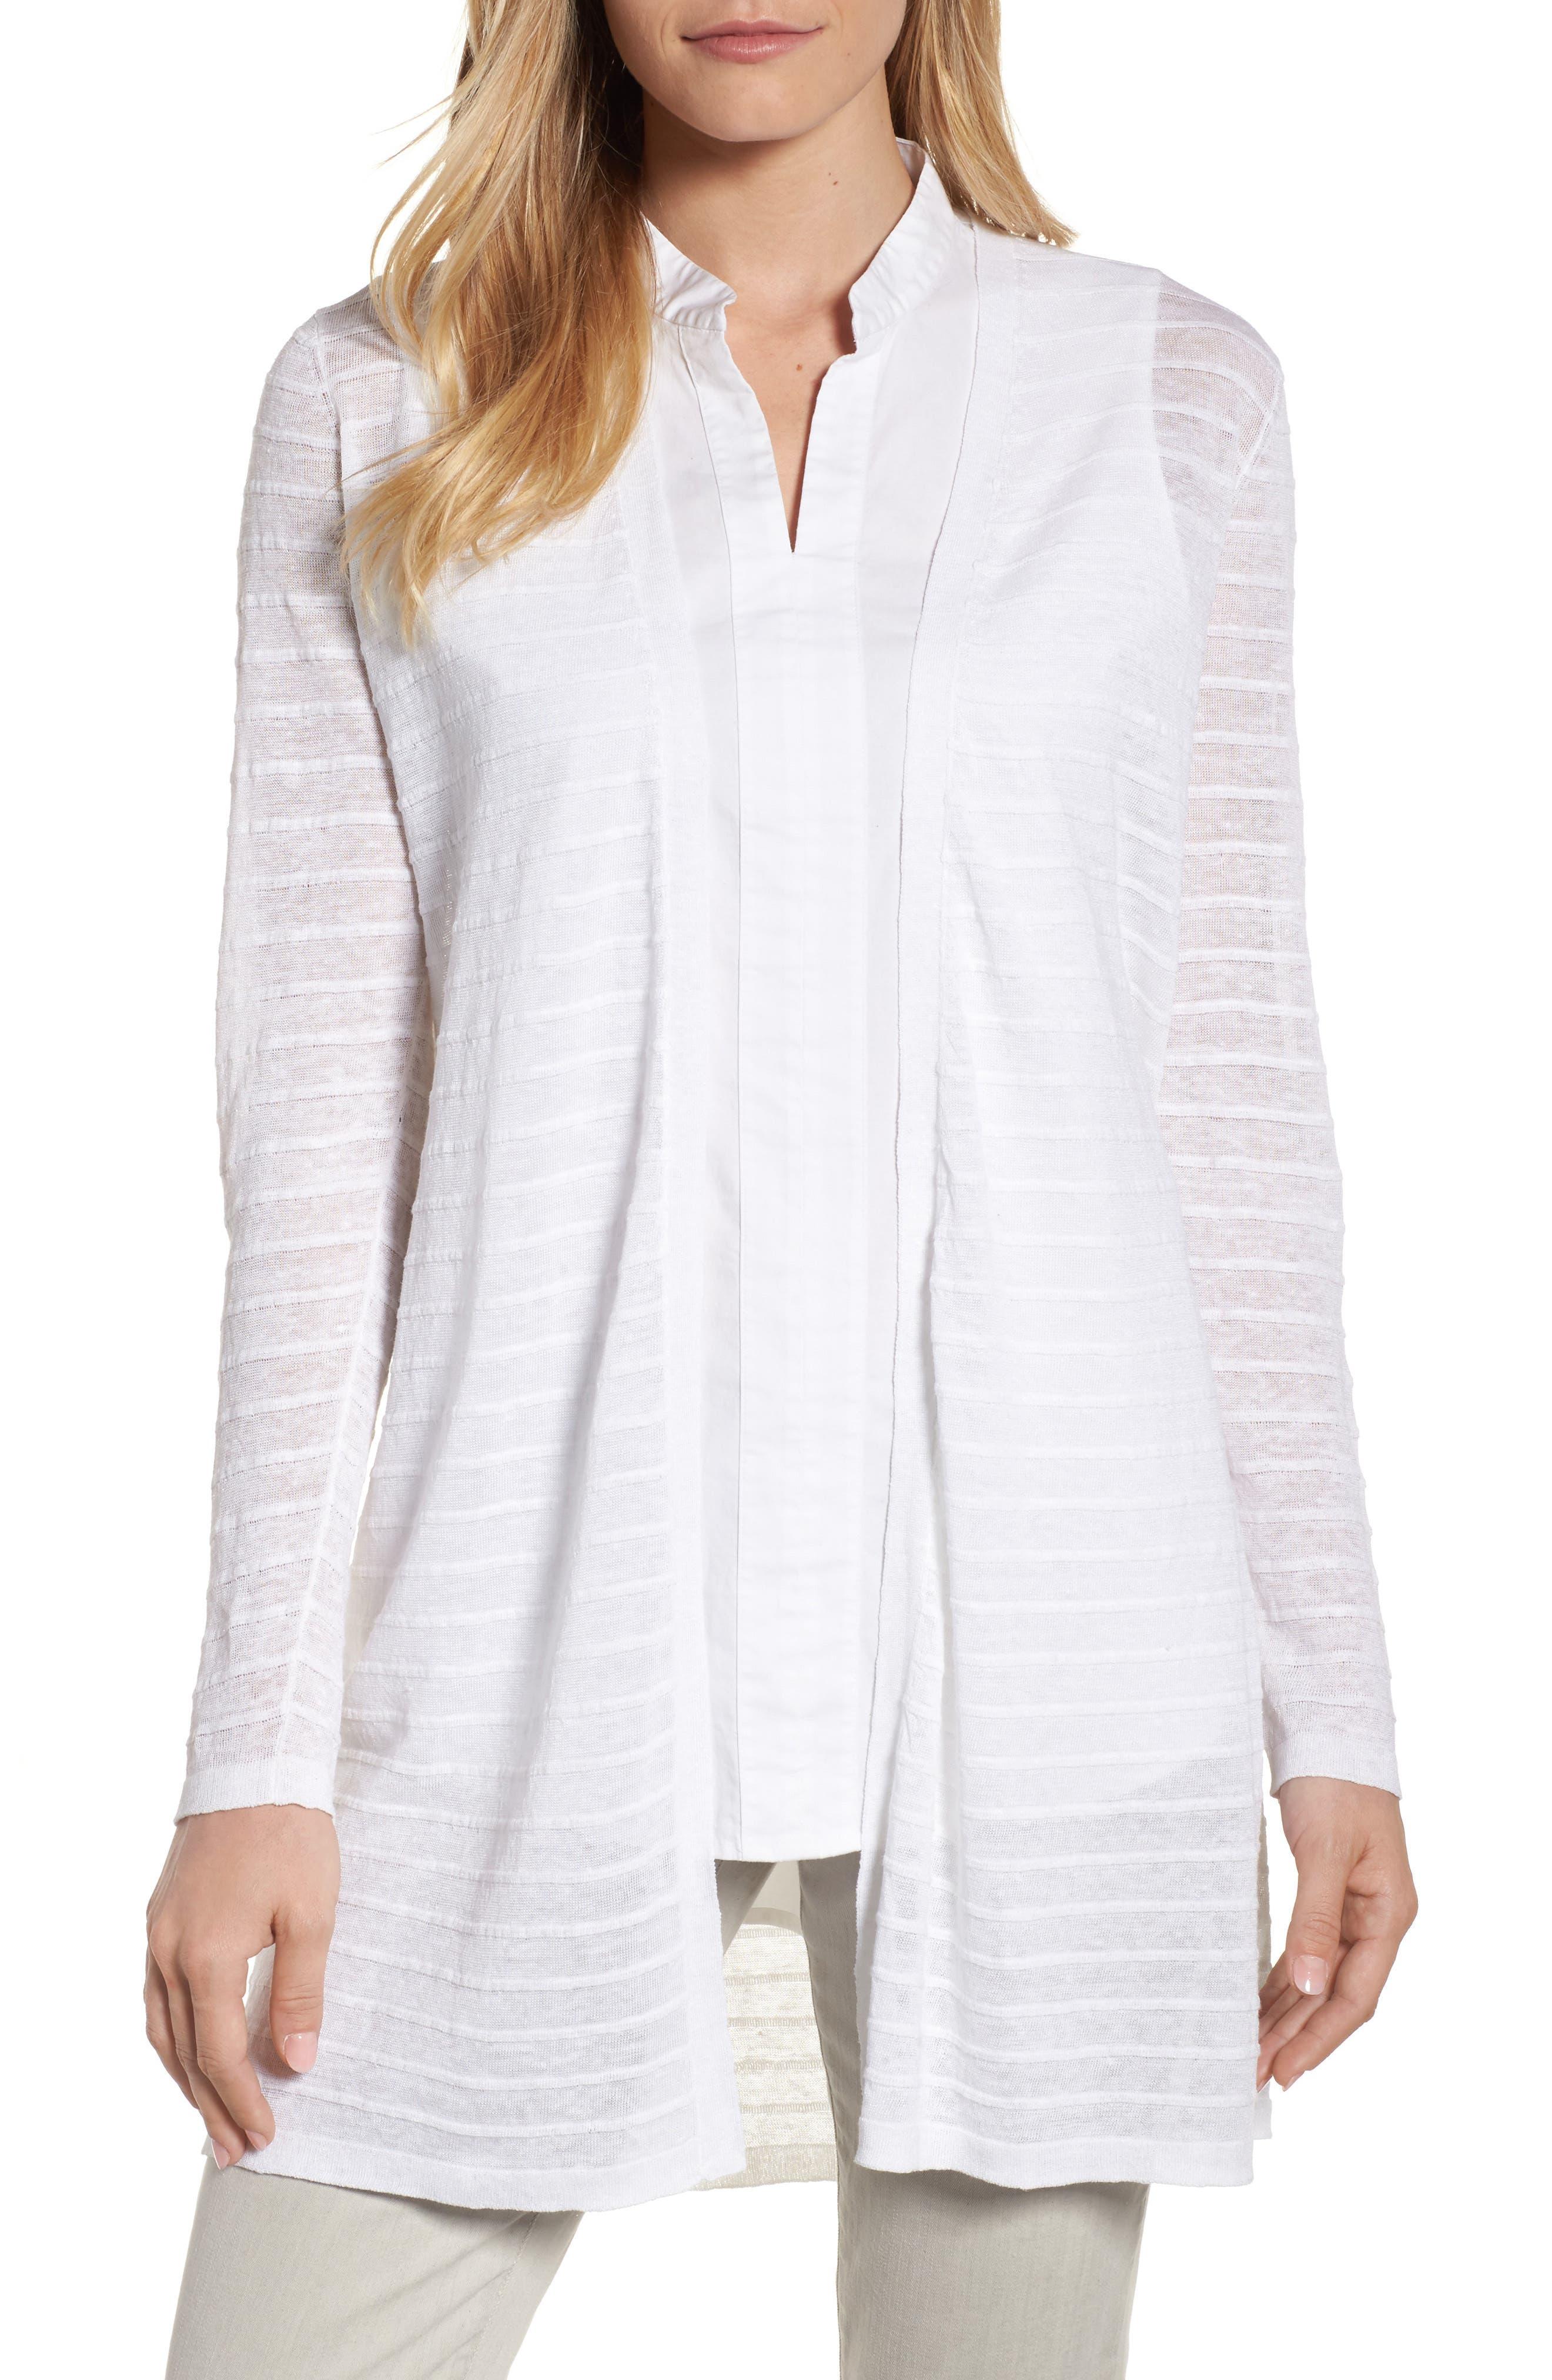 Long Organic Linen Blend Jacquard Cardigan,                         Main,                         color, White